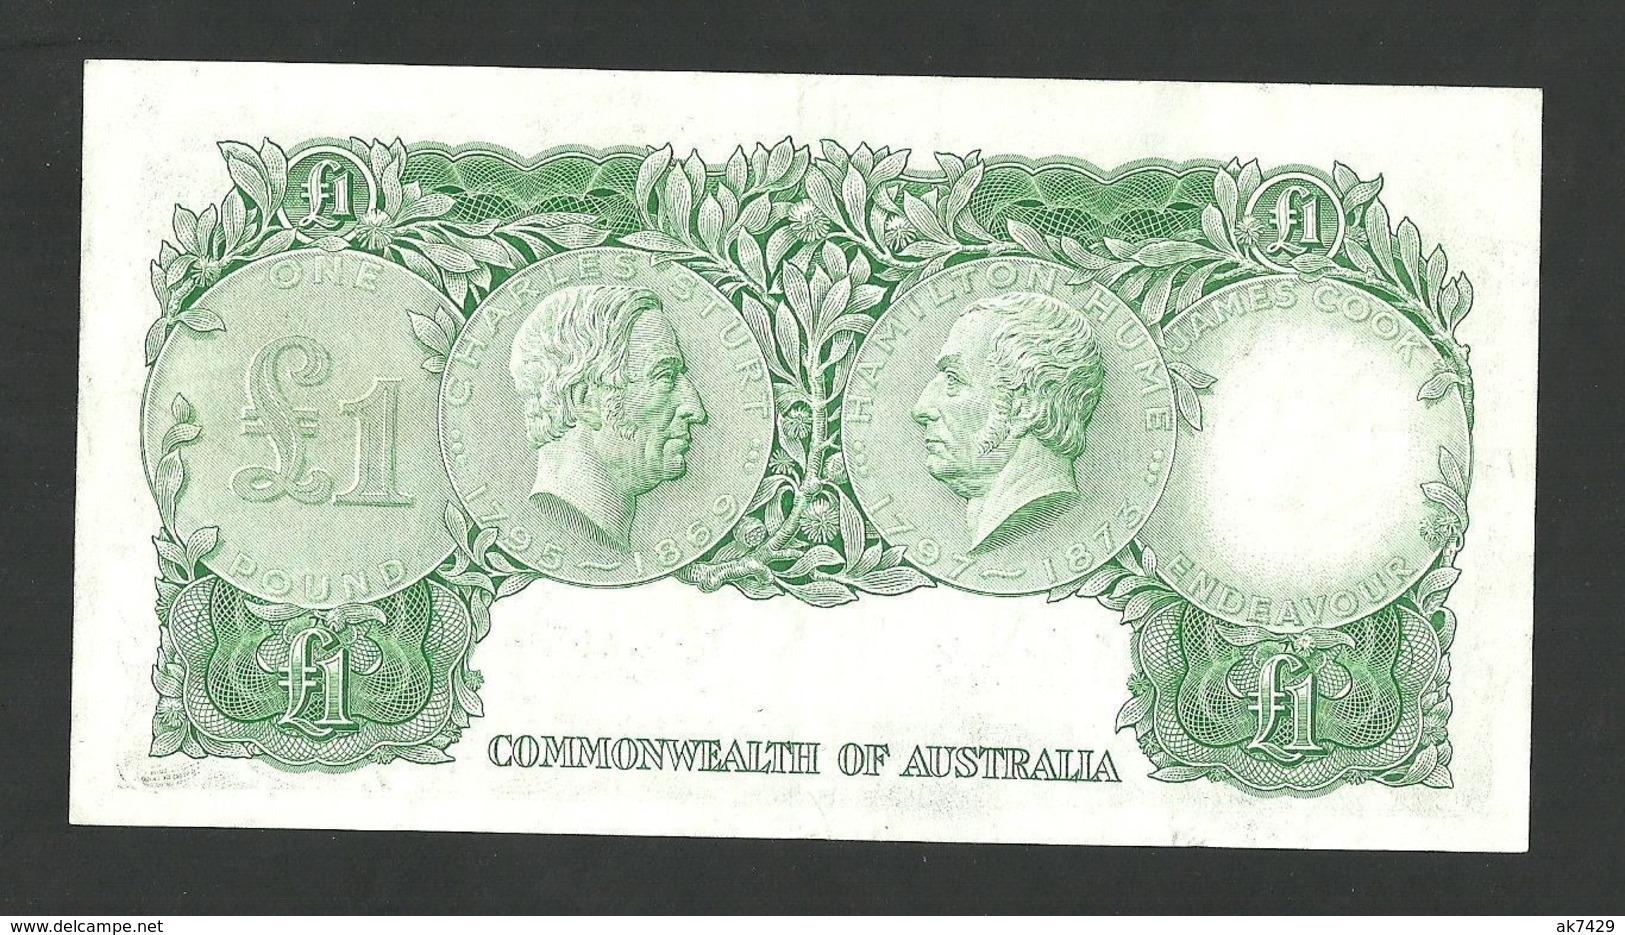 AUSTRALIA 1 POUND 1960 COOMBS-WILSON PREFIX HK/15 PICK#34a VF+ BANKNOTE - 1960-65 Reserve Bank Of Australia